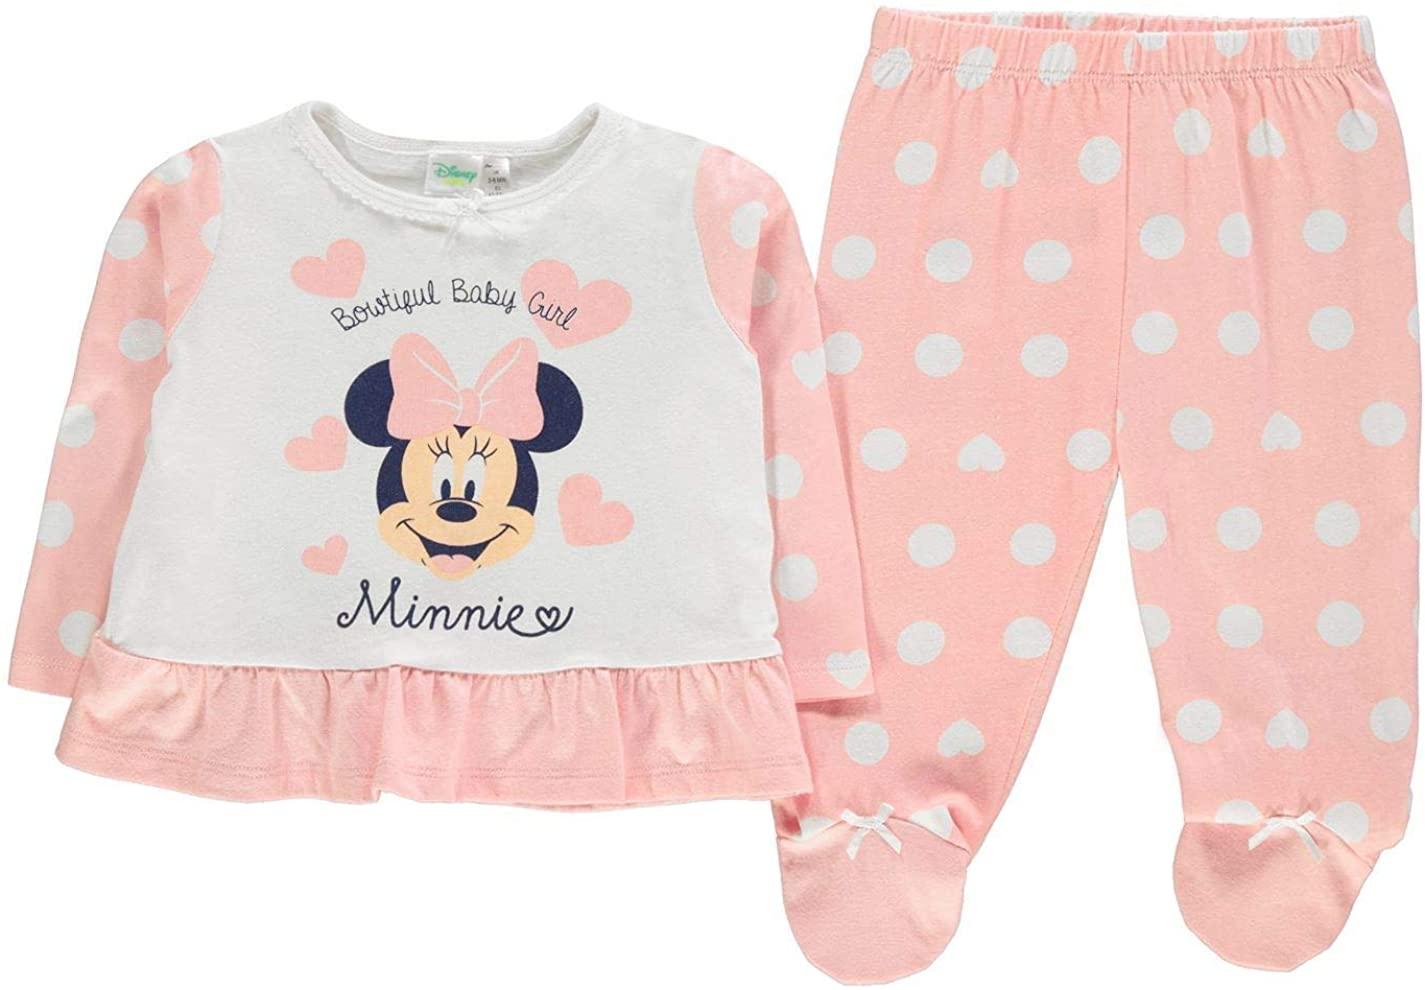 Character Wear Minnie Mouse 2 Piece Pyjama Set Baby Girls Pink Pajamas Nightwear